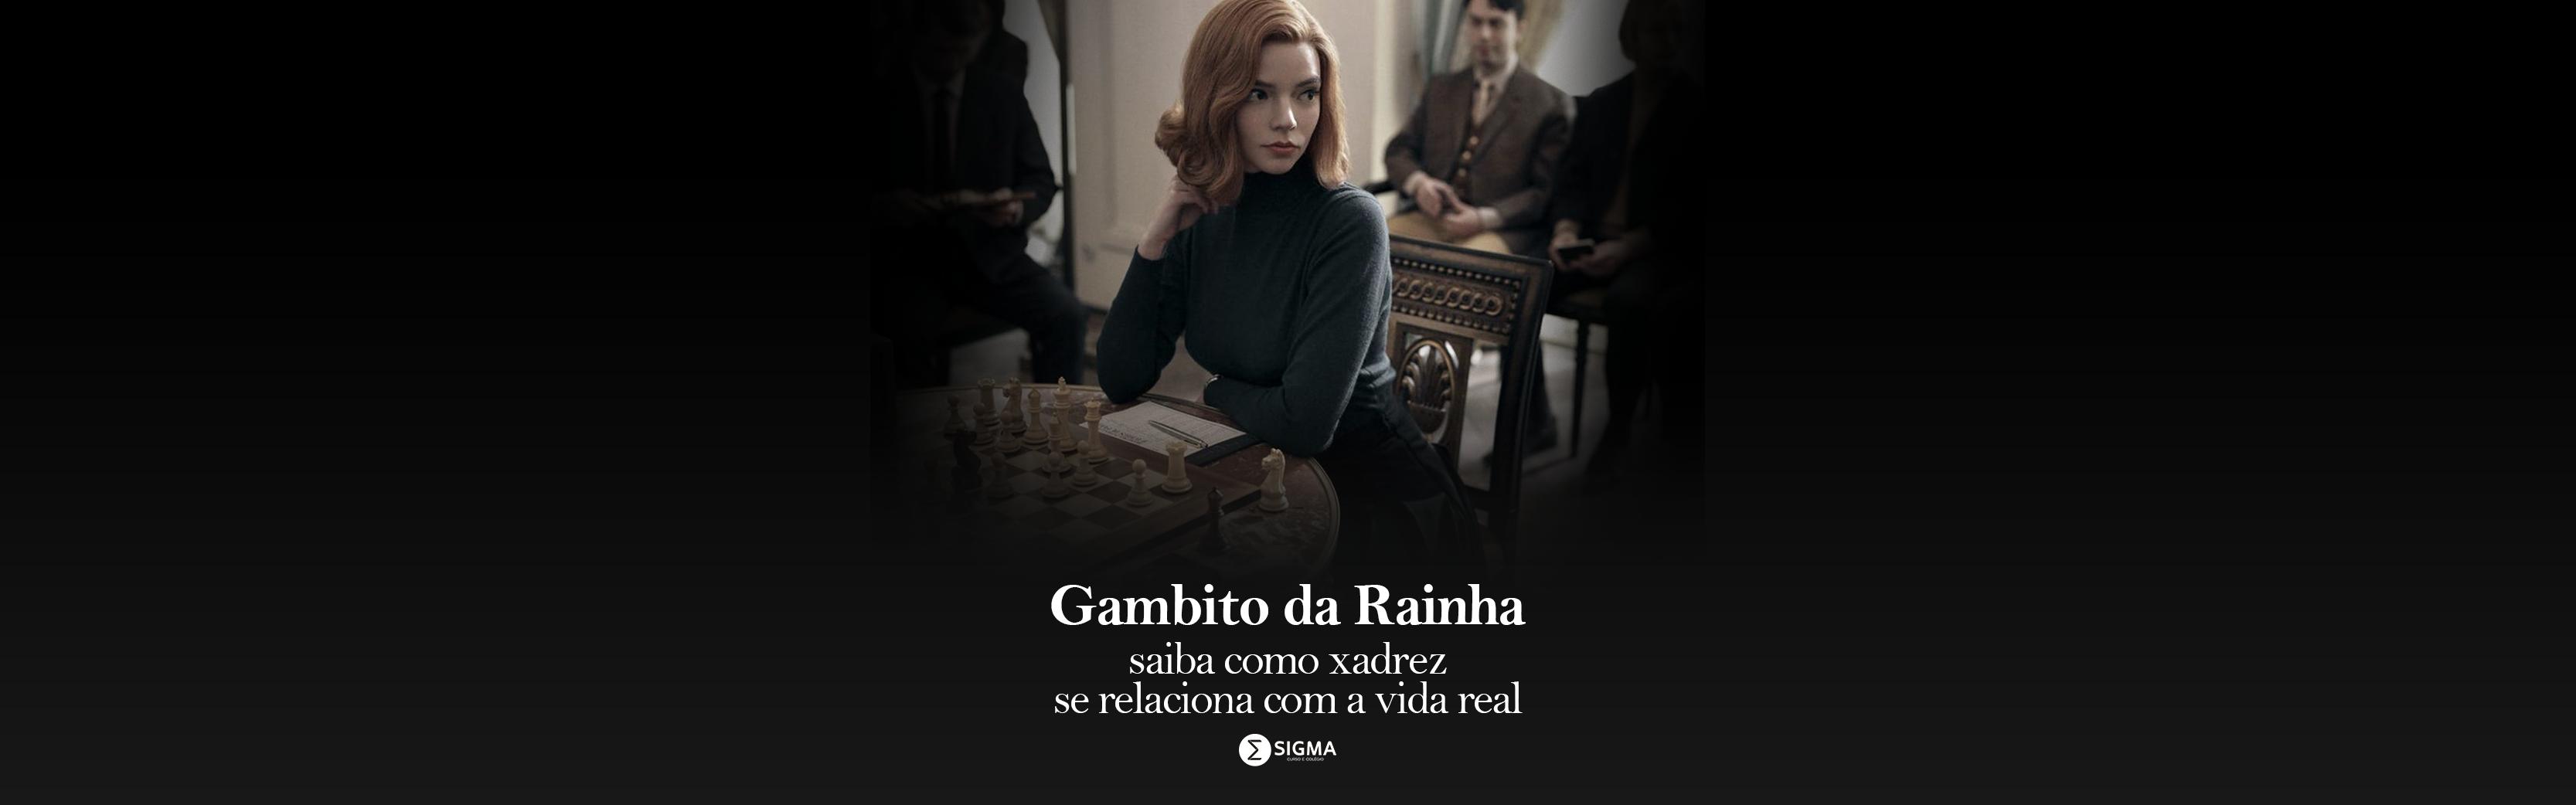 Gambito da Rainha: saiba como xadrez se relaciona com a vida real